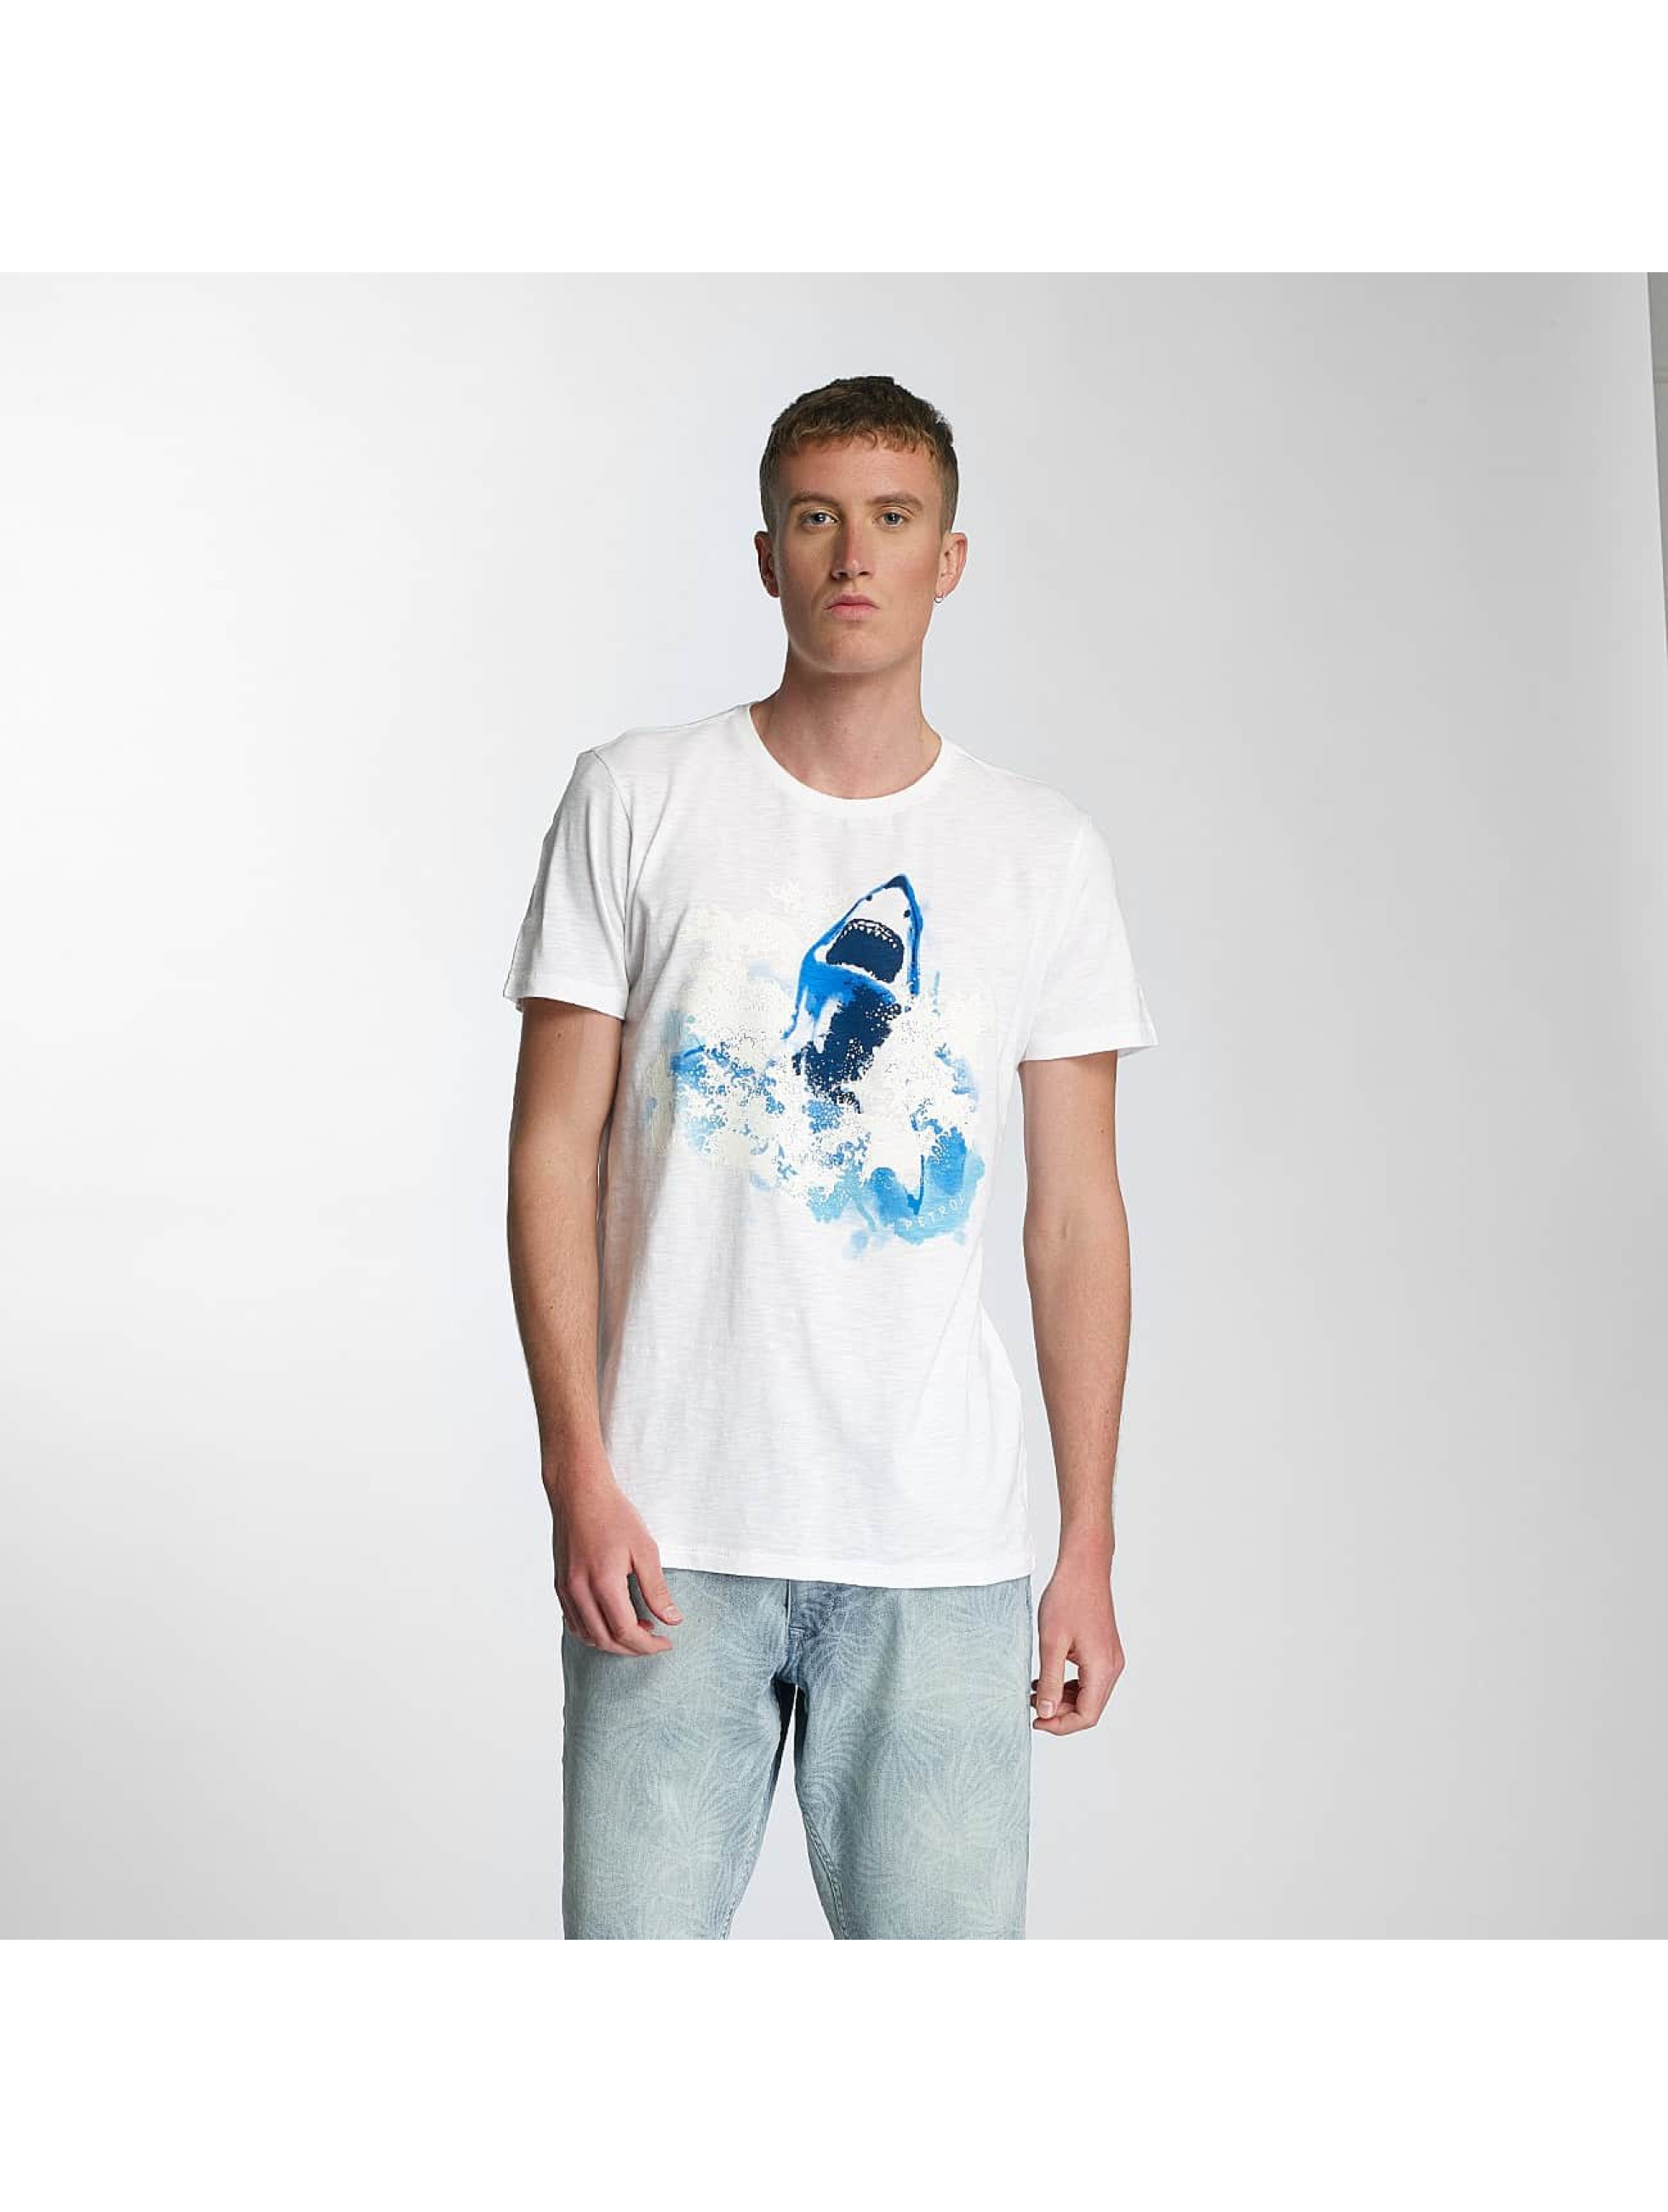 Schipkau Angebote Petrol Industries Männer T-Shirt Shark in weiß